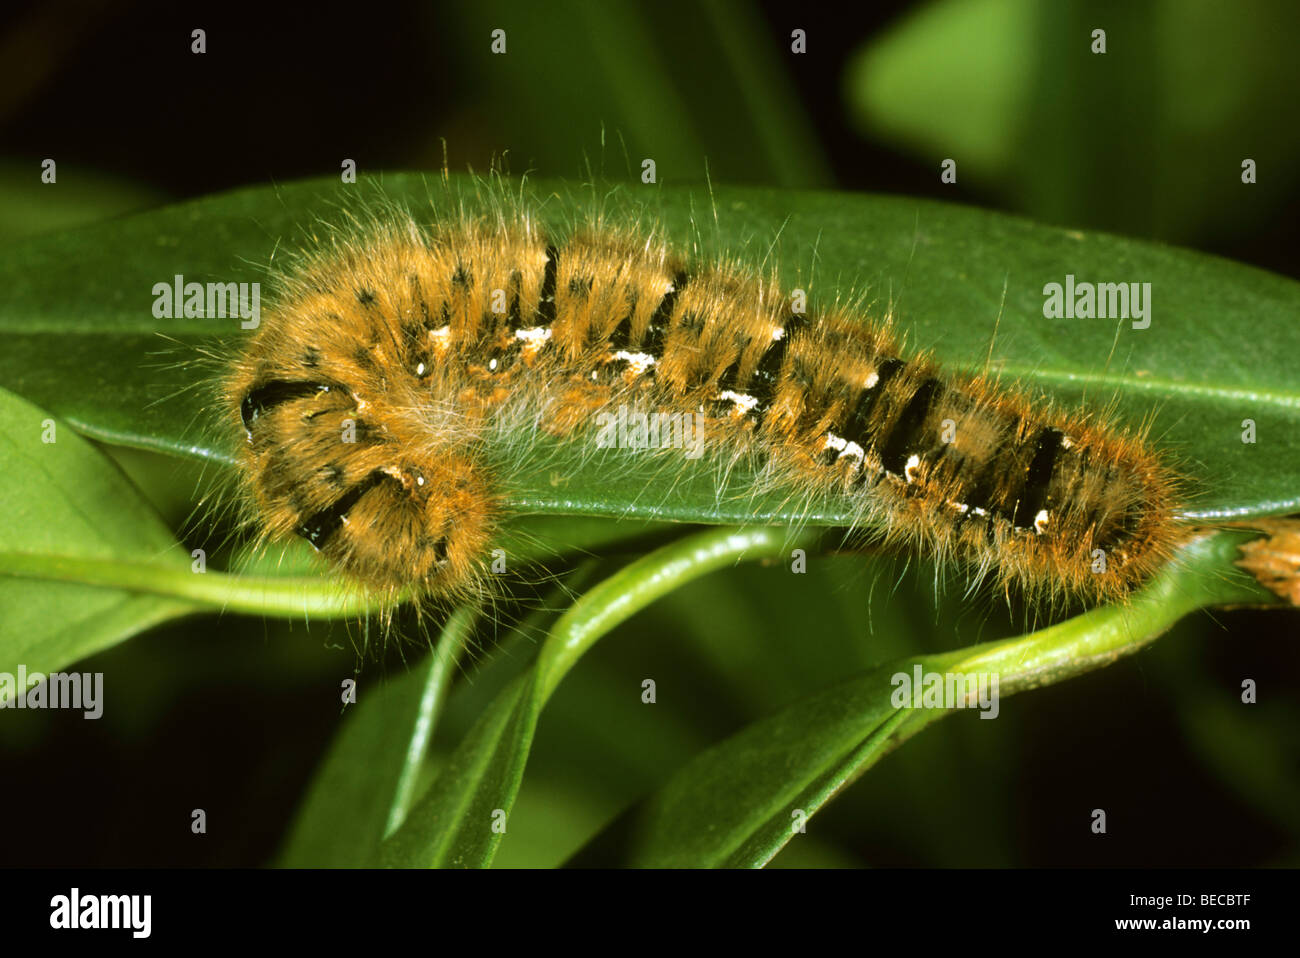 Oak Eggar (Lasiocampa quercus), caterpillar - Stock Image